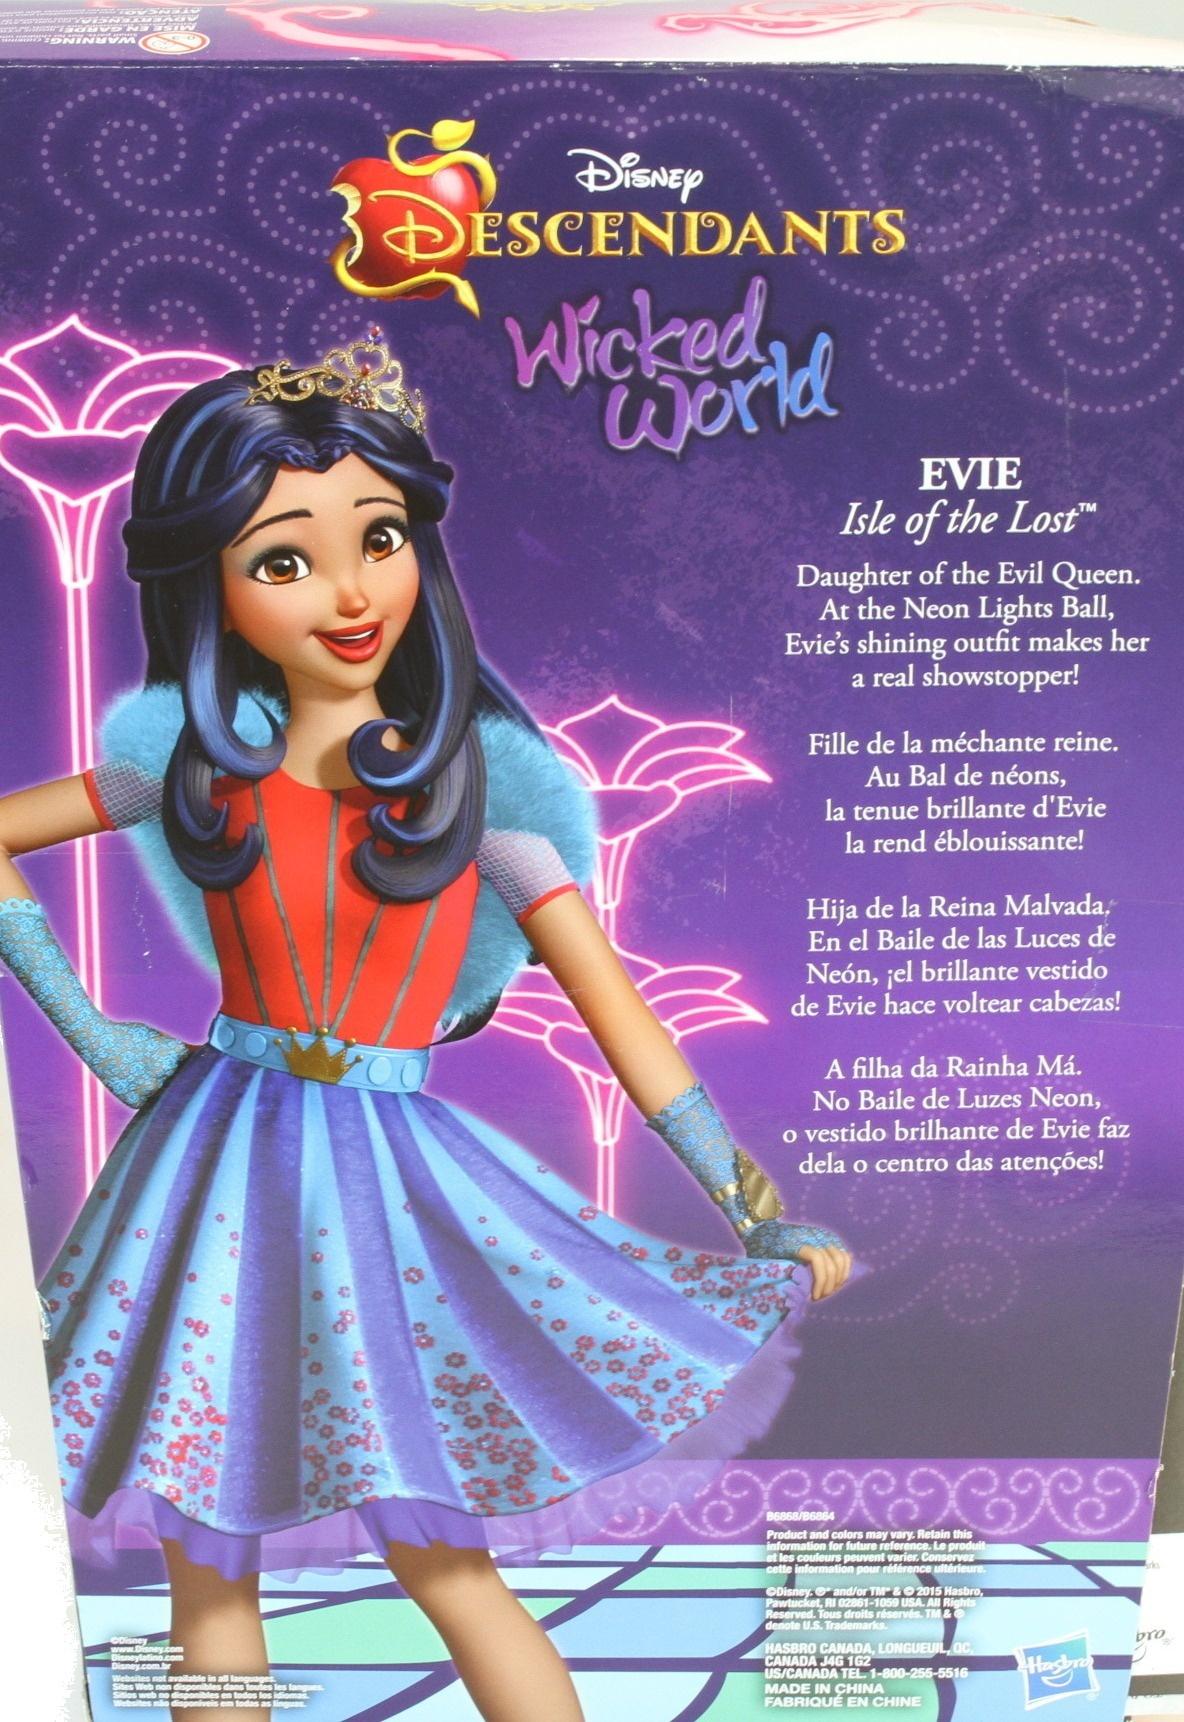 Disney Descendants Neon Lights Feature Evie of Isle of the Lost